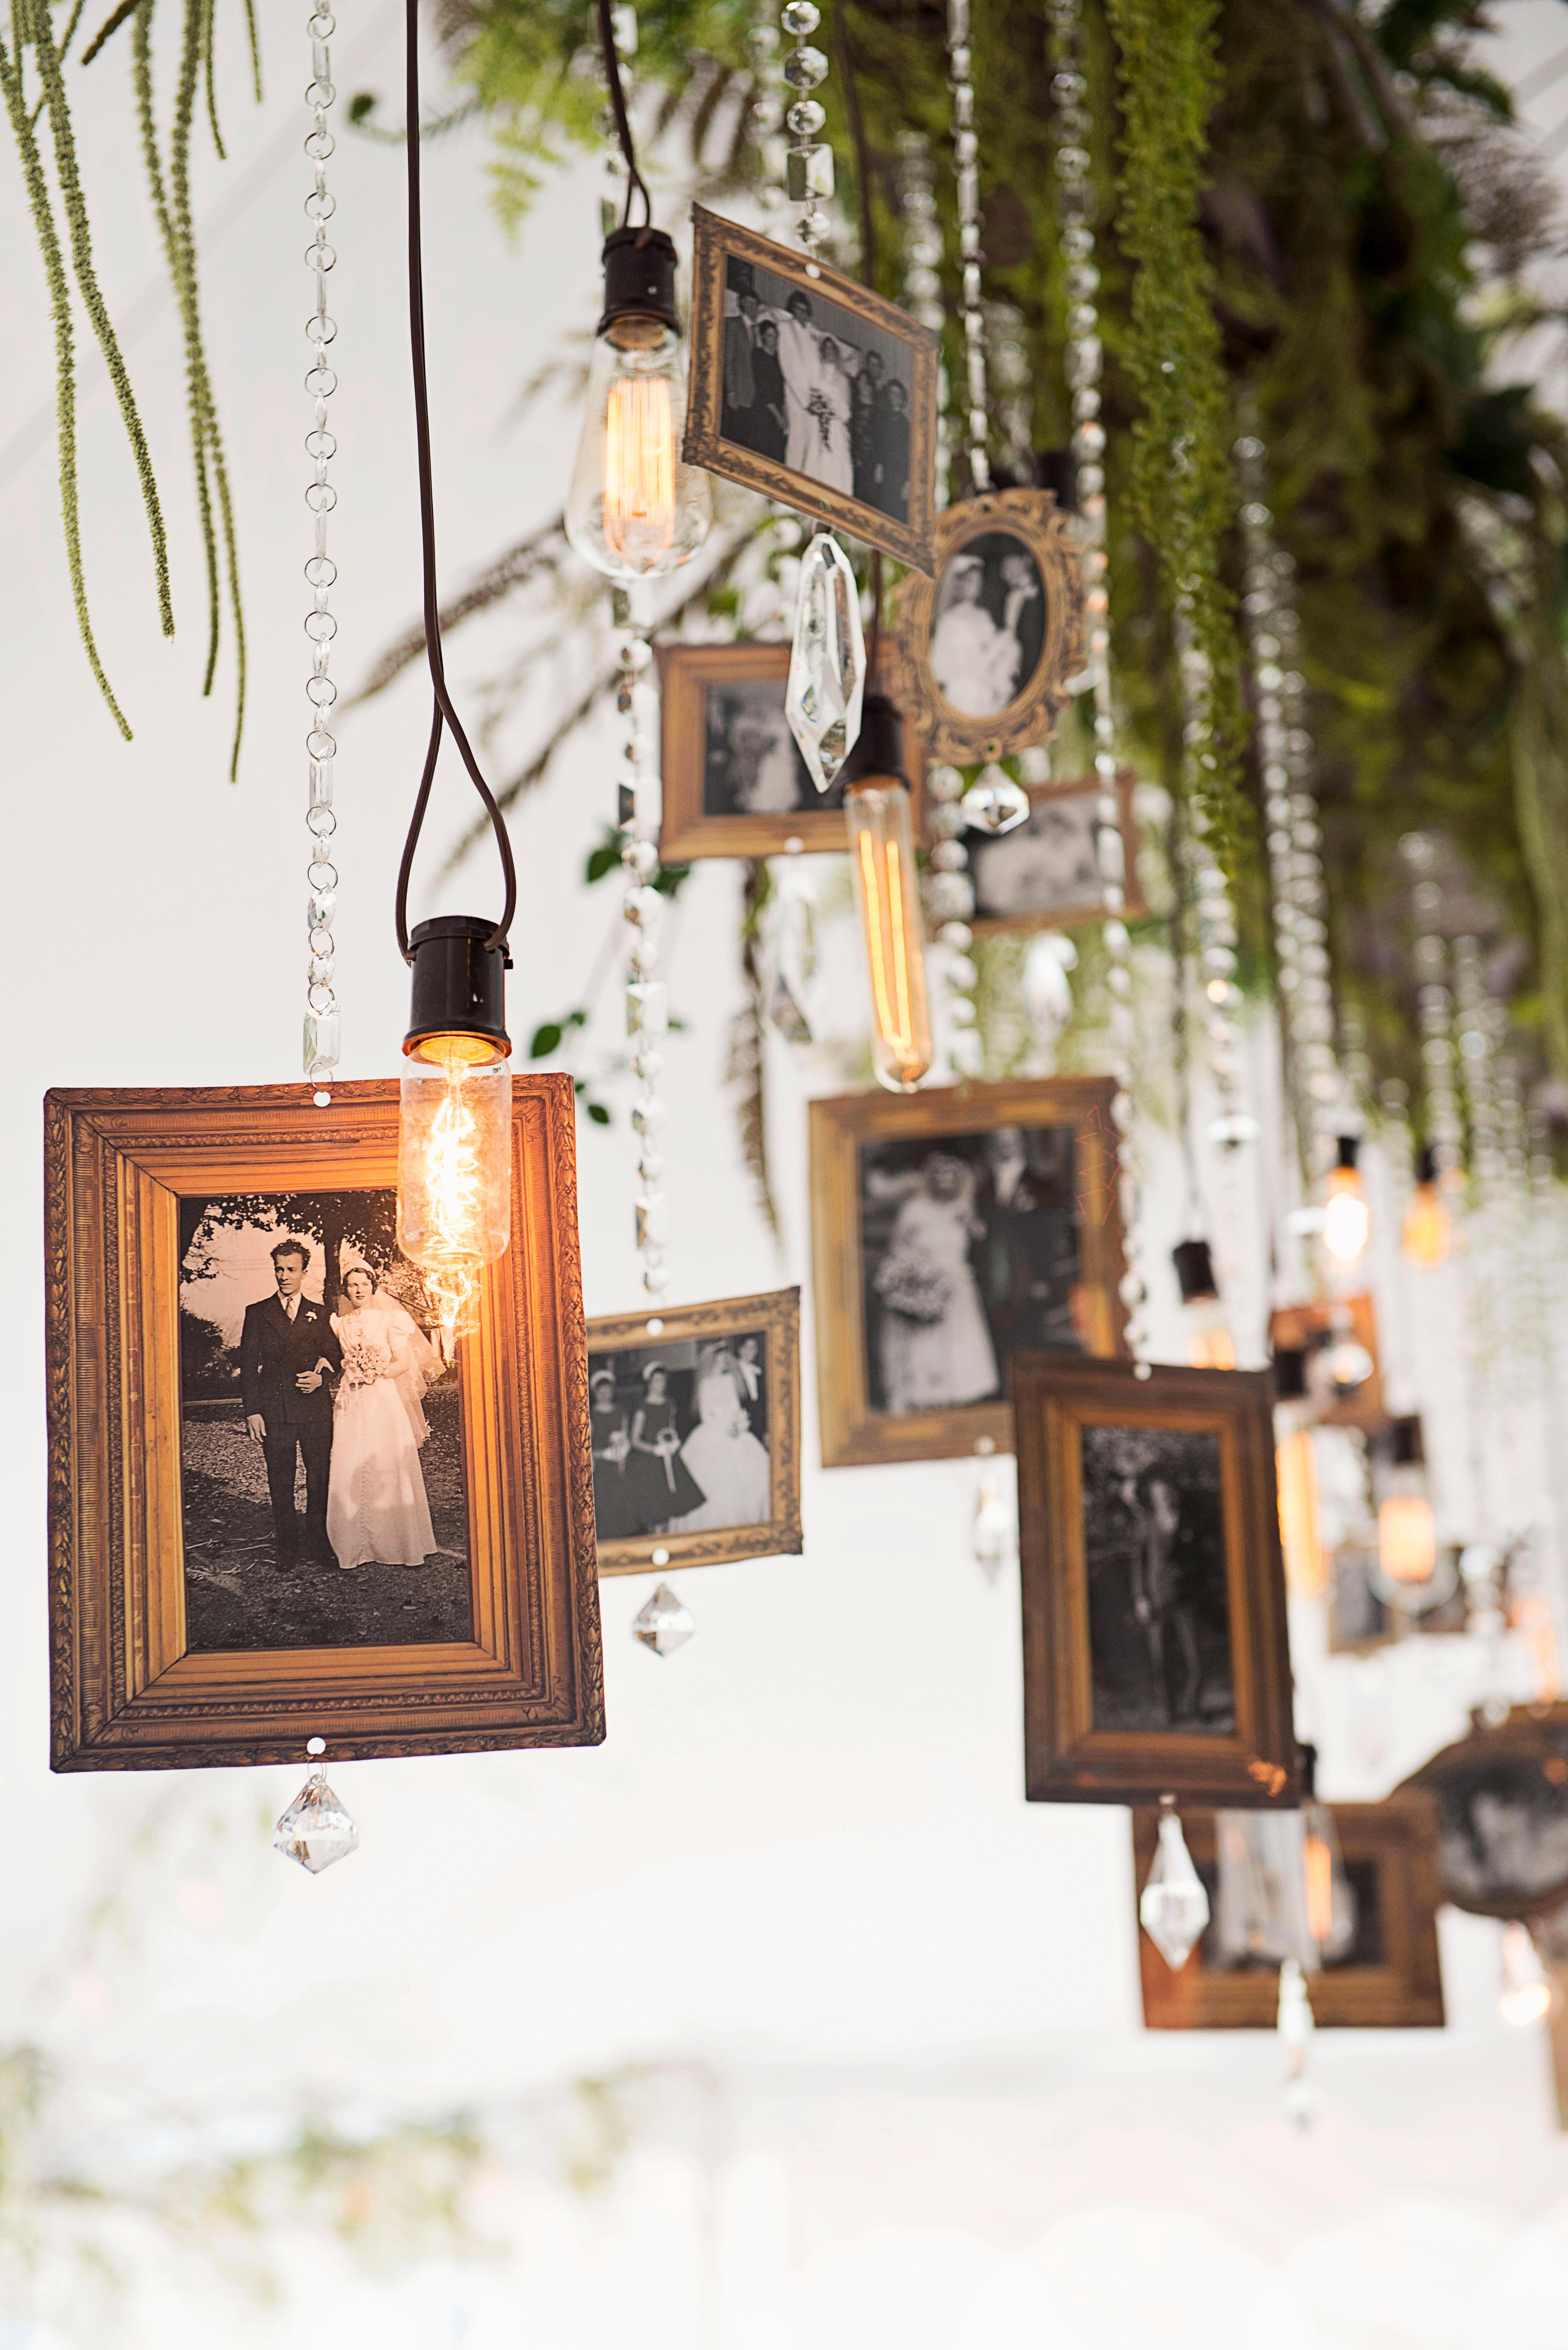 hanging frames and light bulbs wedding decor